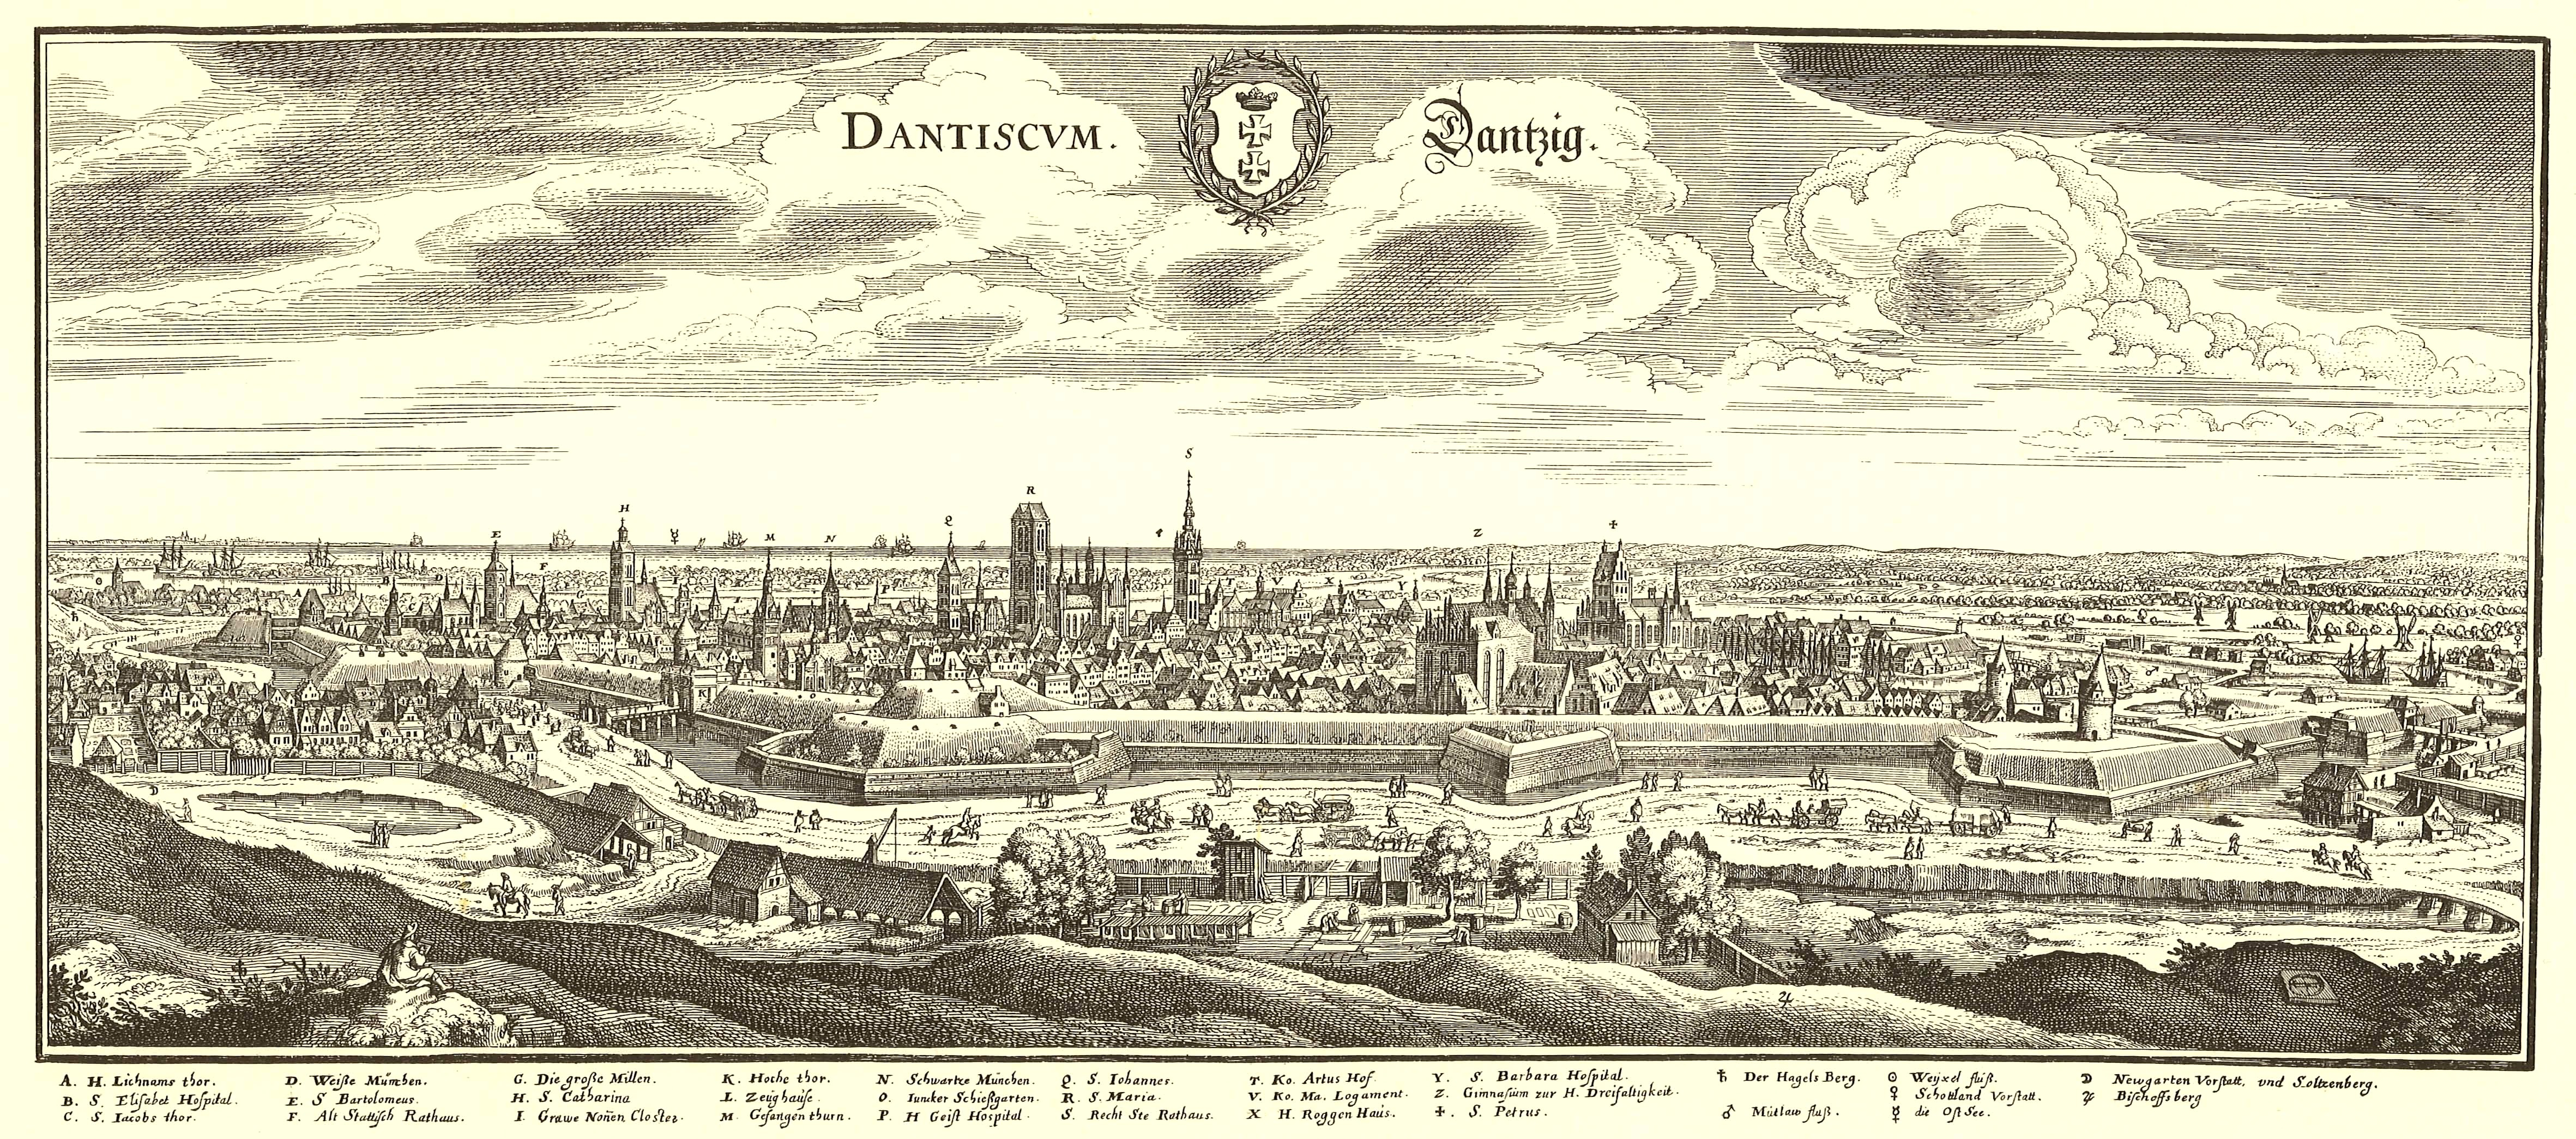 File:Danzig Merian 1643 Farbe.jpg